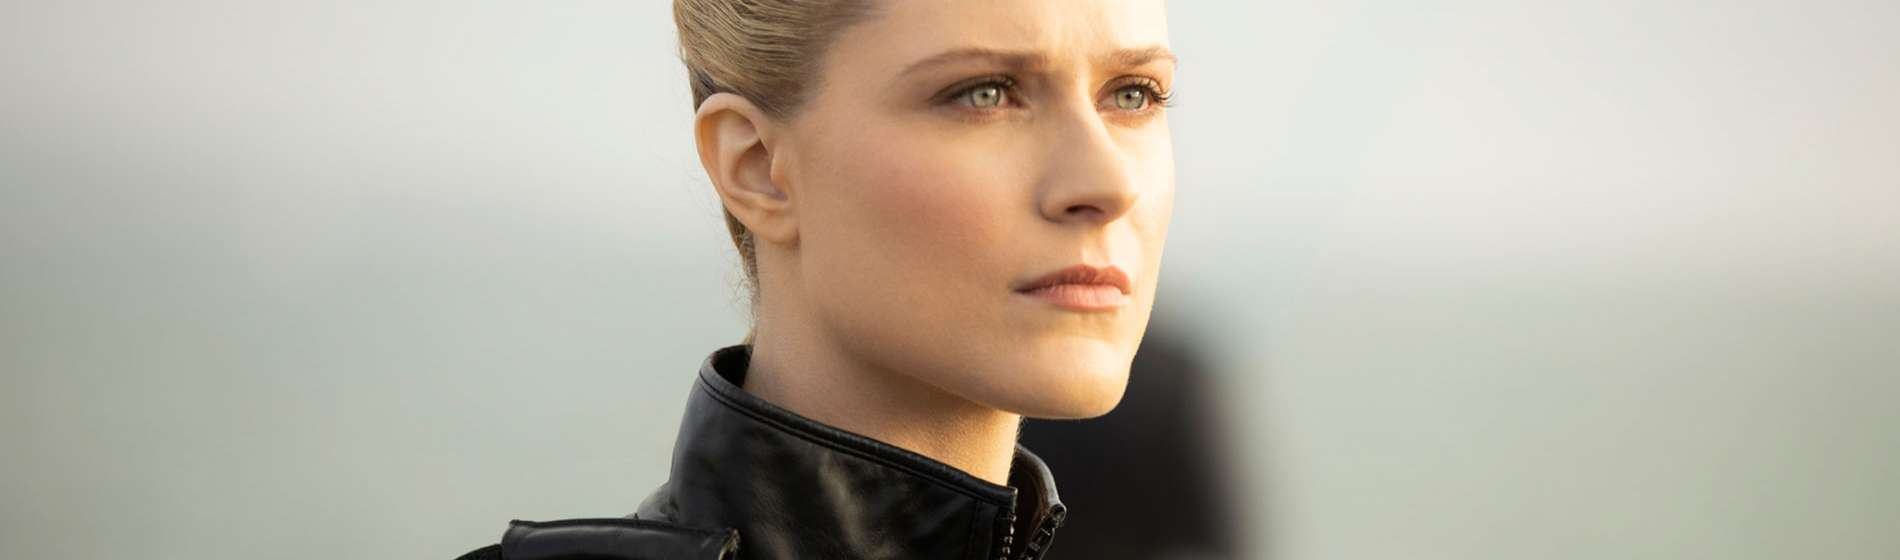 Westworld Season 3 Episode 1 Dolores